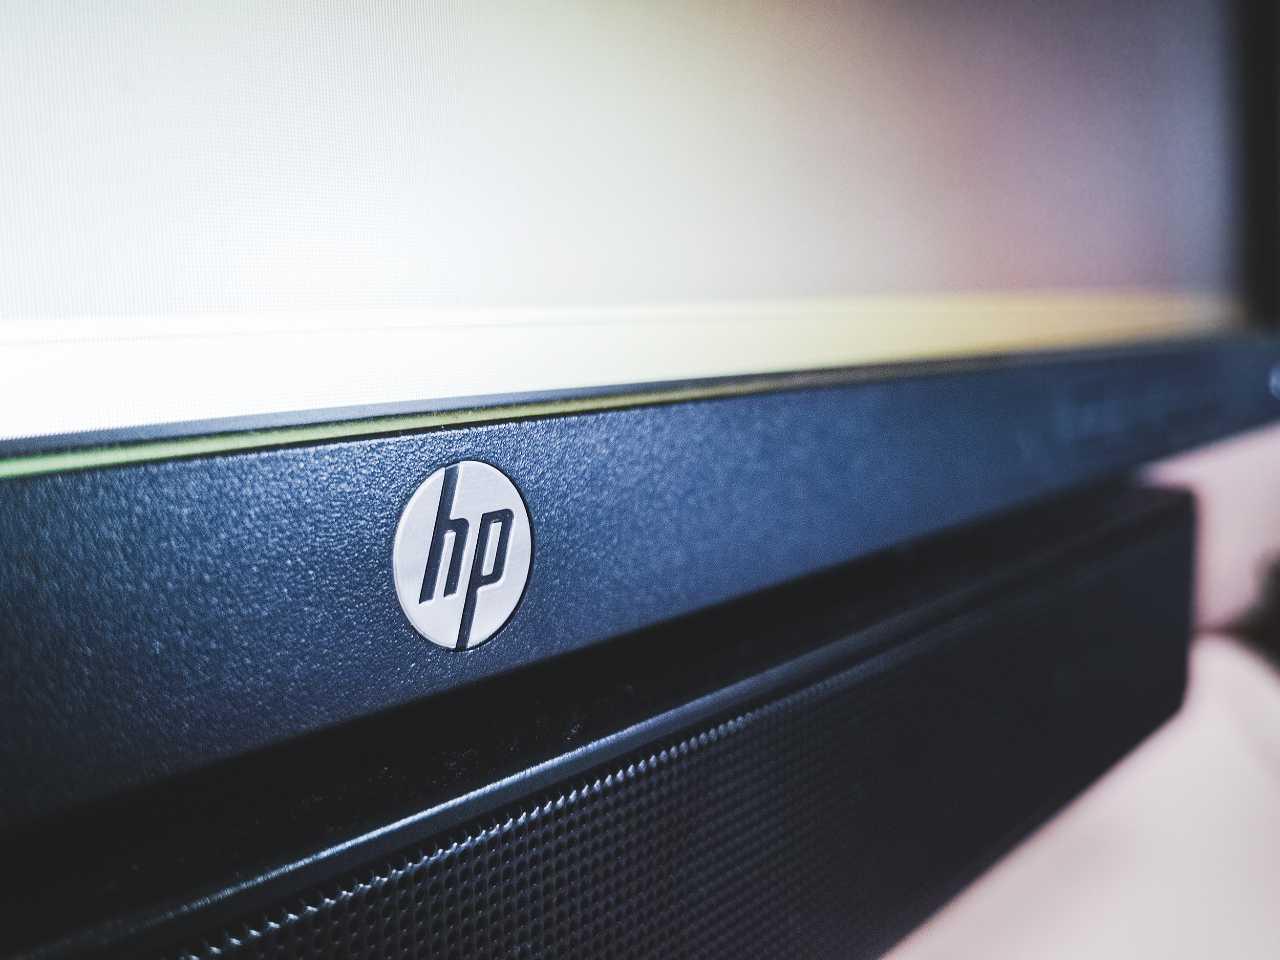 Stampante HP (Adobe Stock)